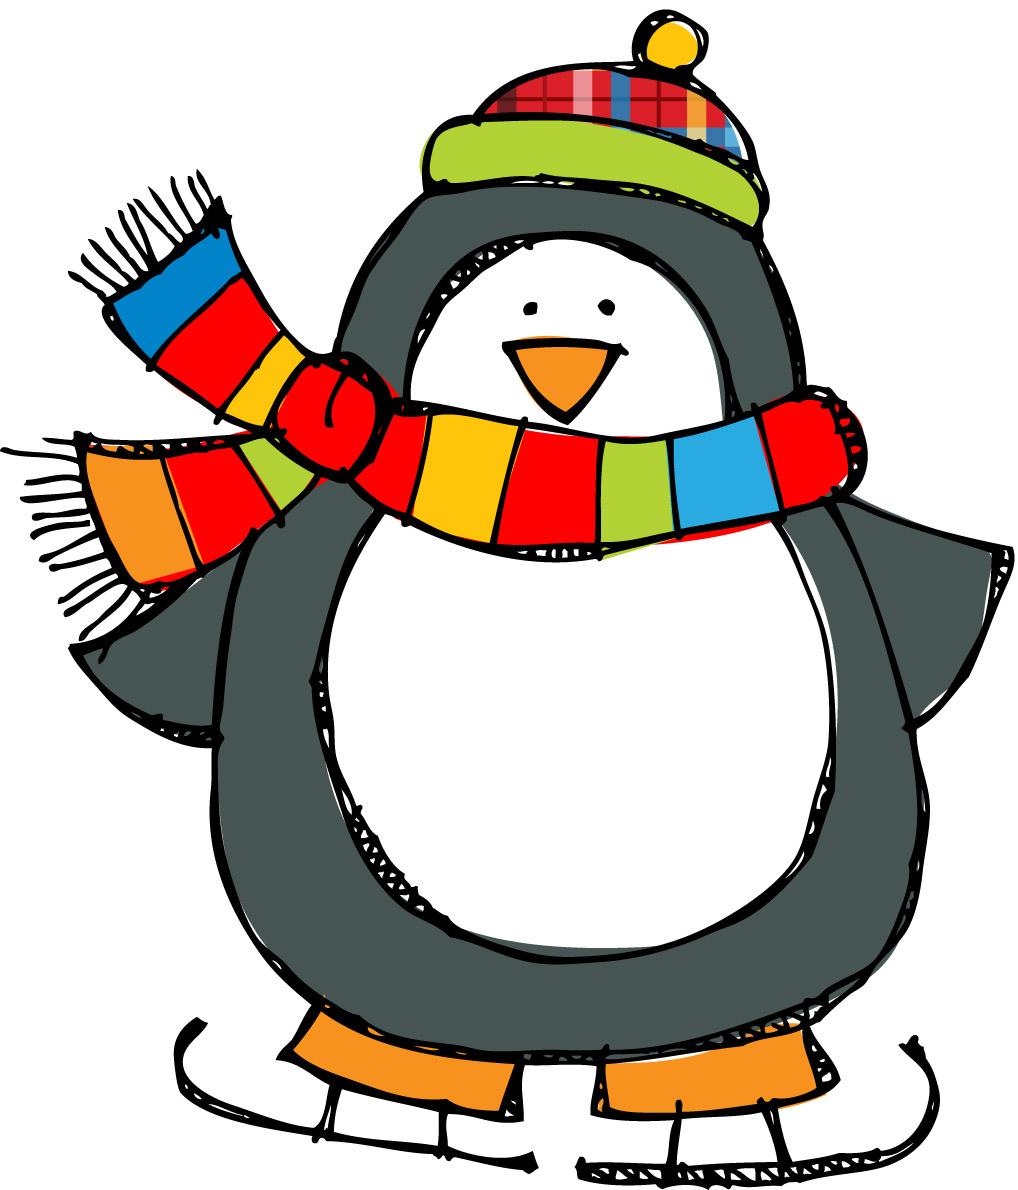 Winter Penguin Clipart Clipart Panda Fre-Winter Penguin Clipart Clipart Panda Free Clipart Images-3